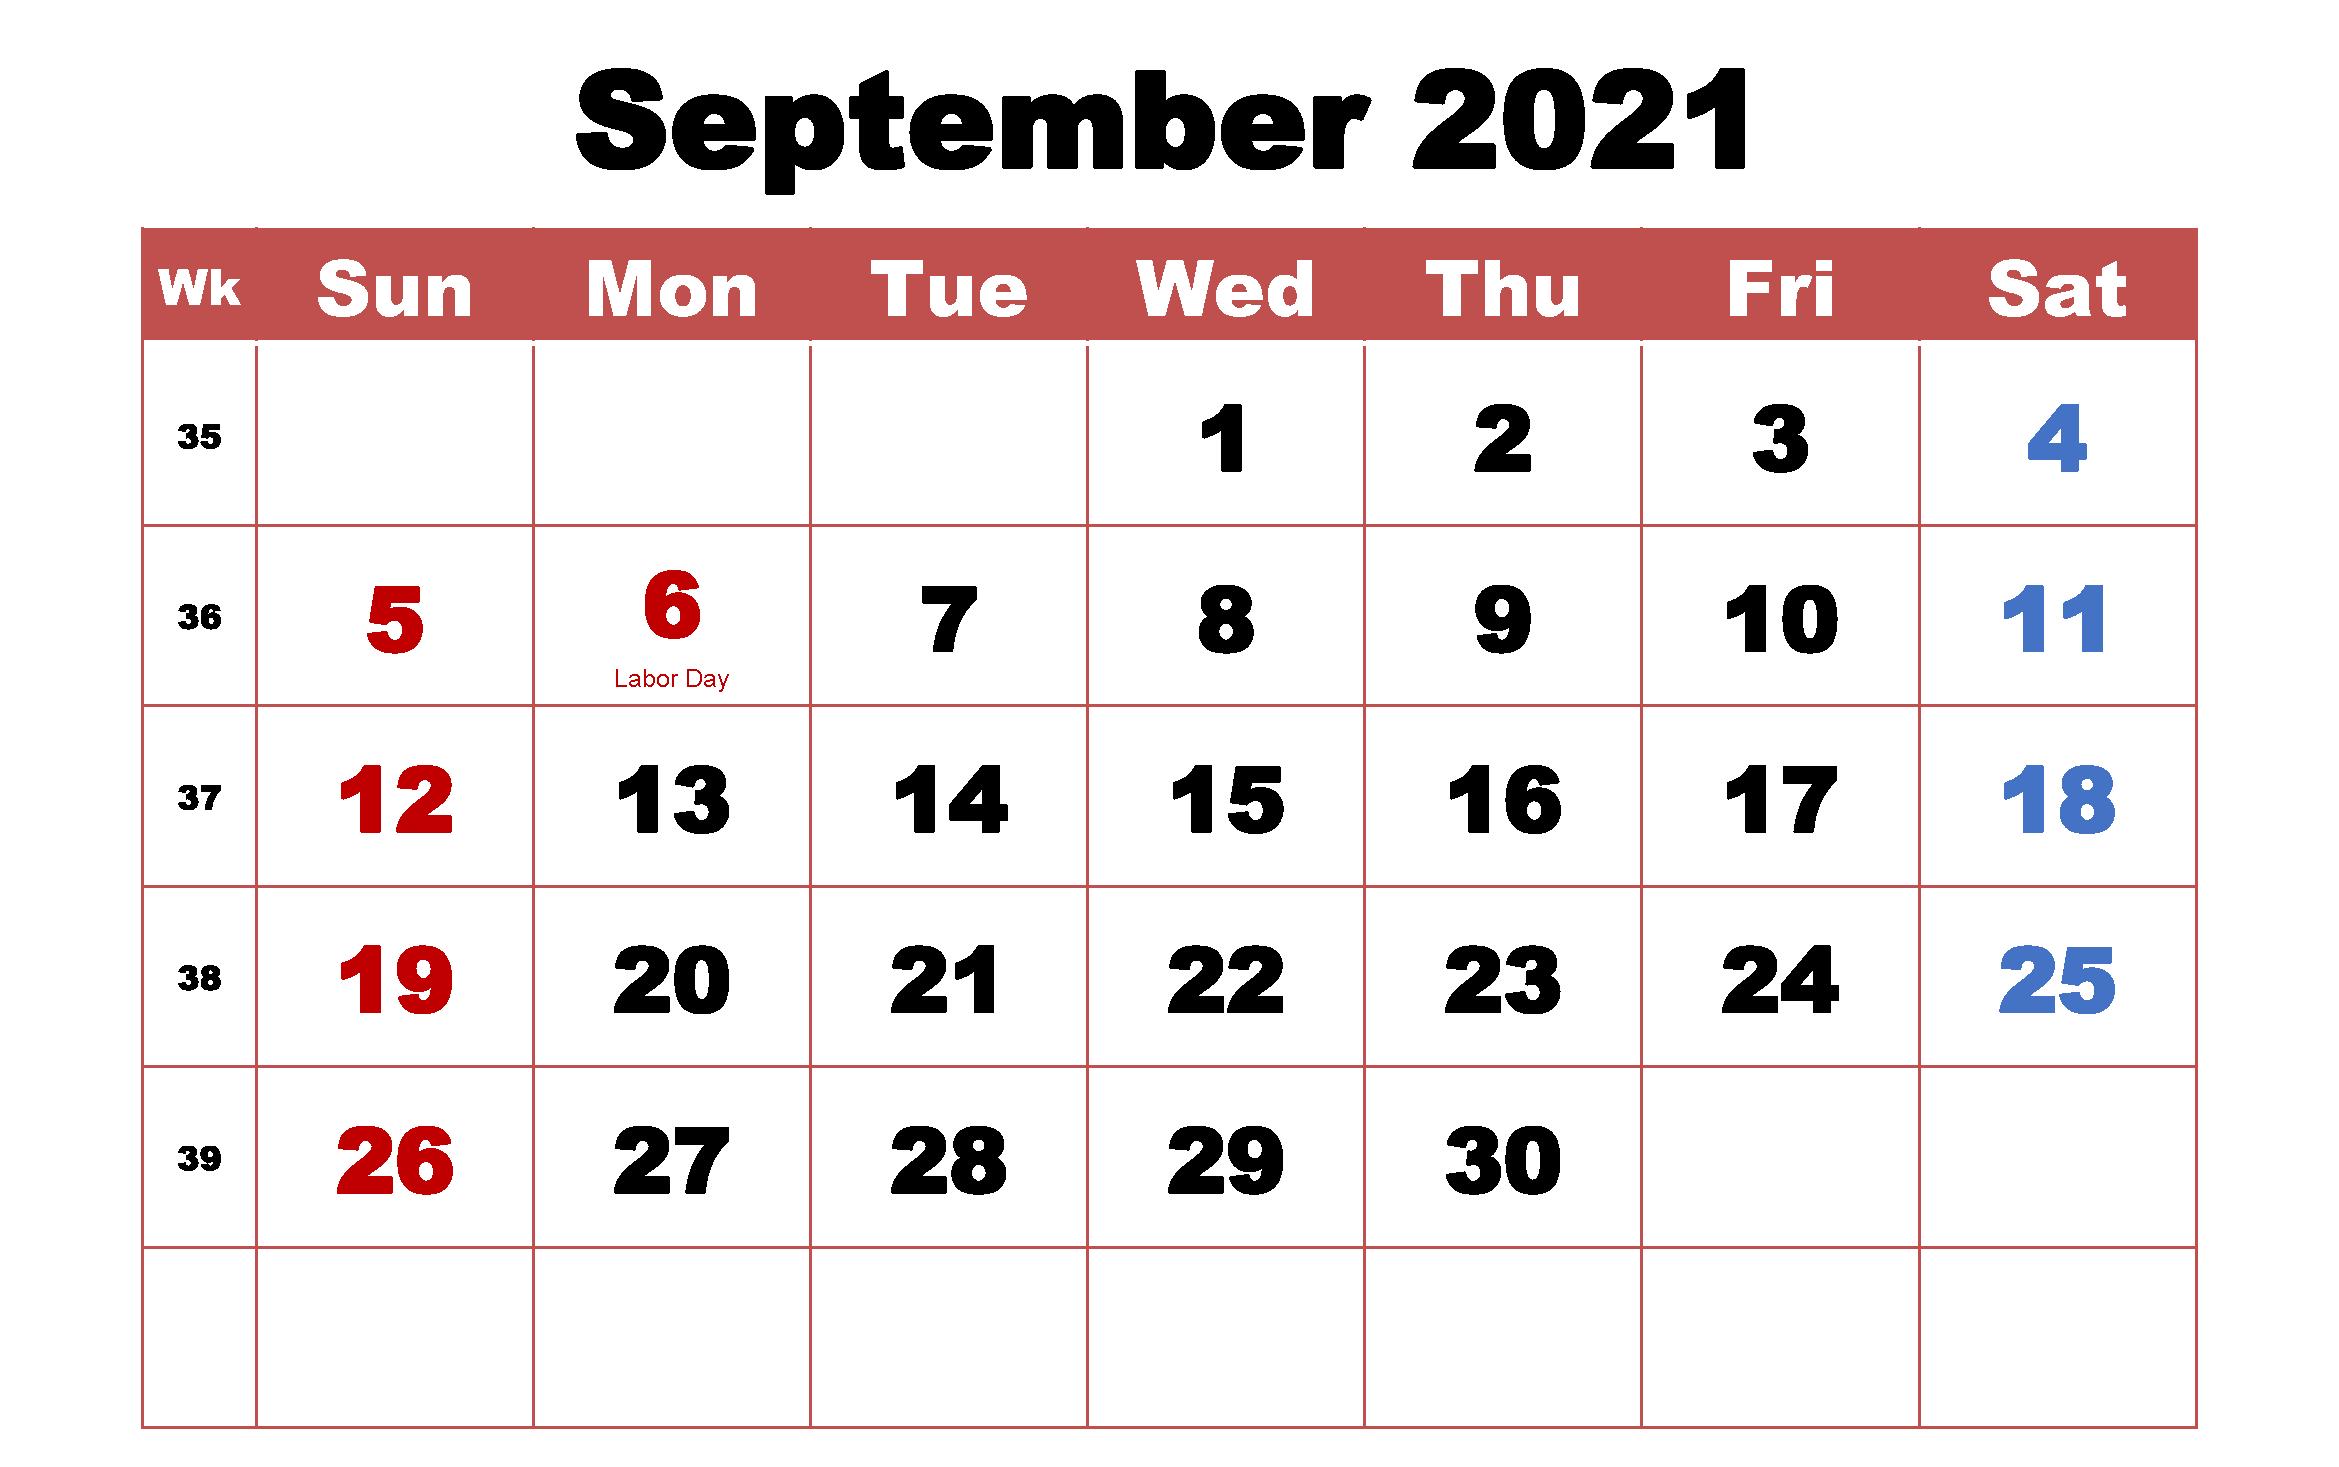 September 2021 Monthly Holidays Calendar